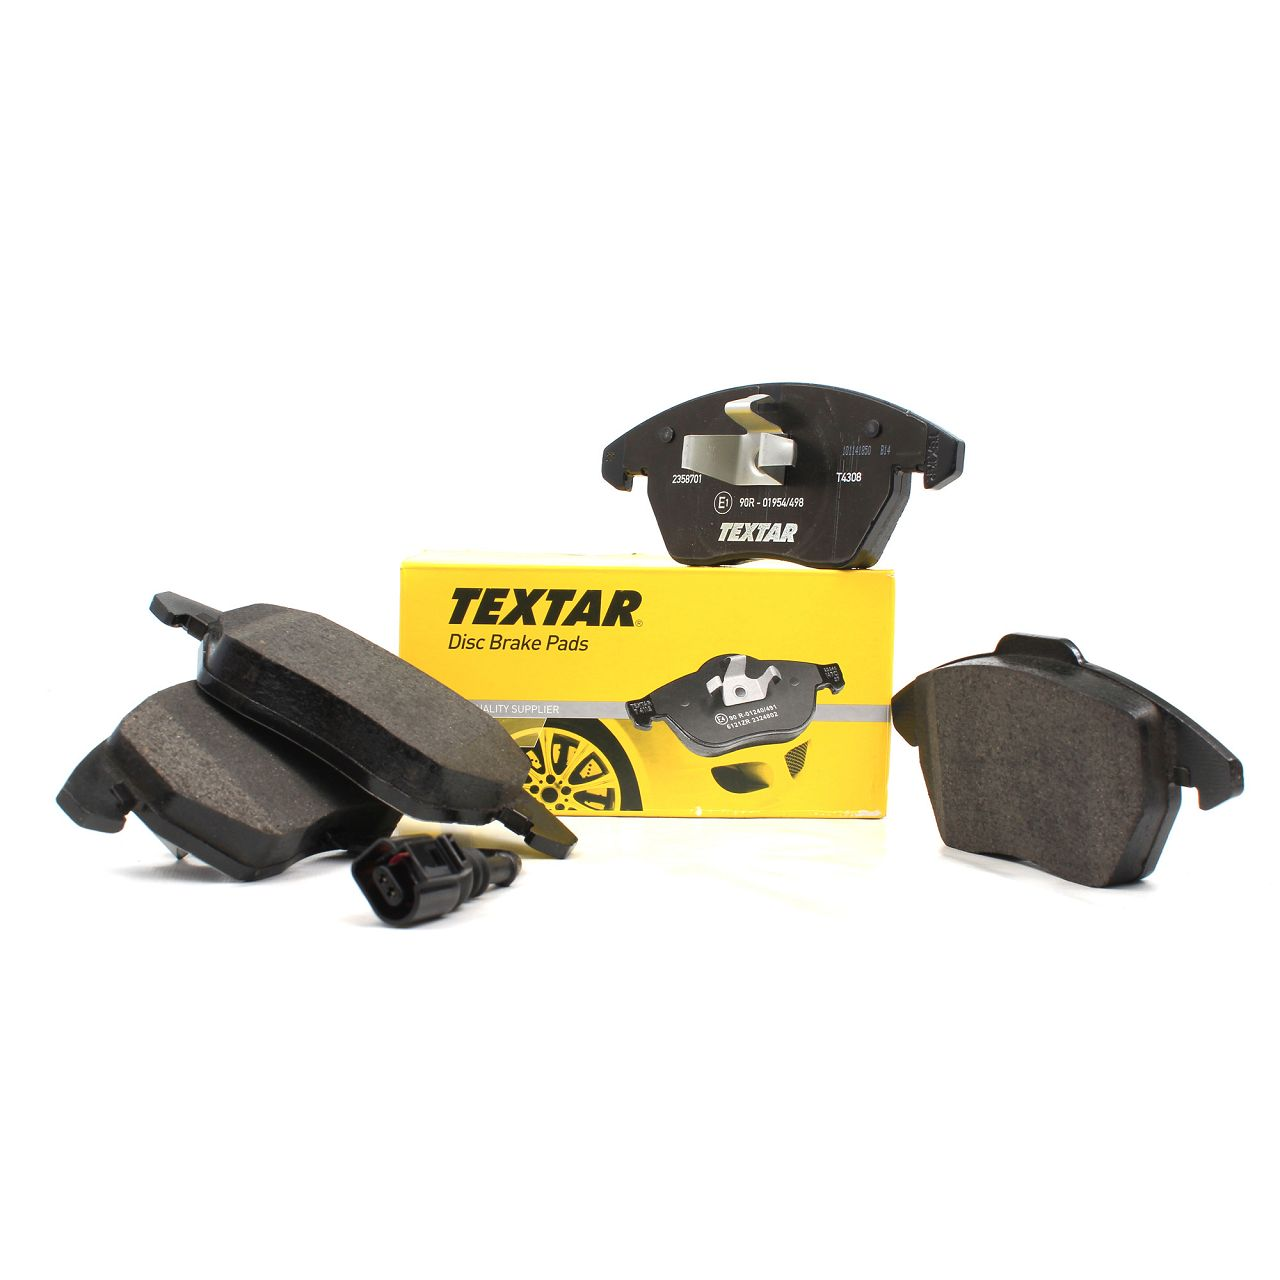 TEXTAR Bremsbeläge + Wako AUDI A1 A3 8P SEAT SKODA VW Golf 5 6 Passat Polo vorne